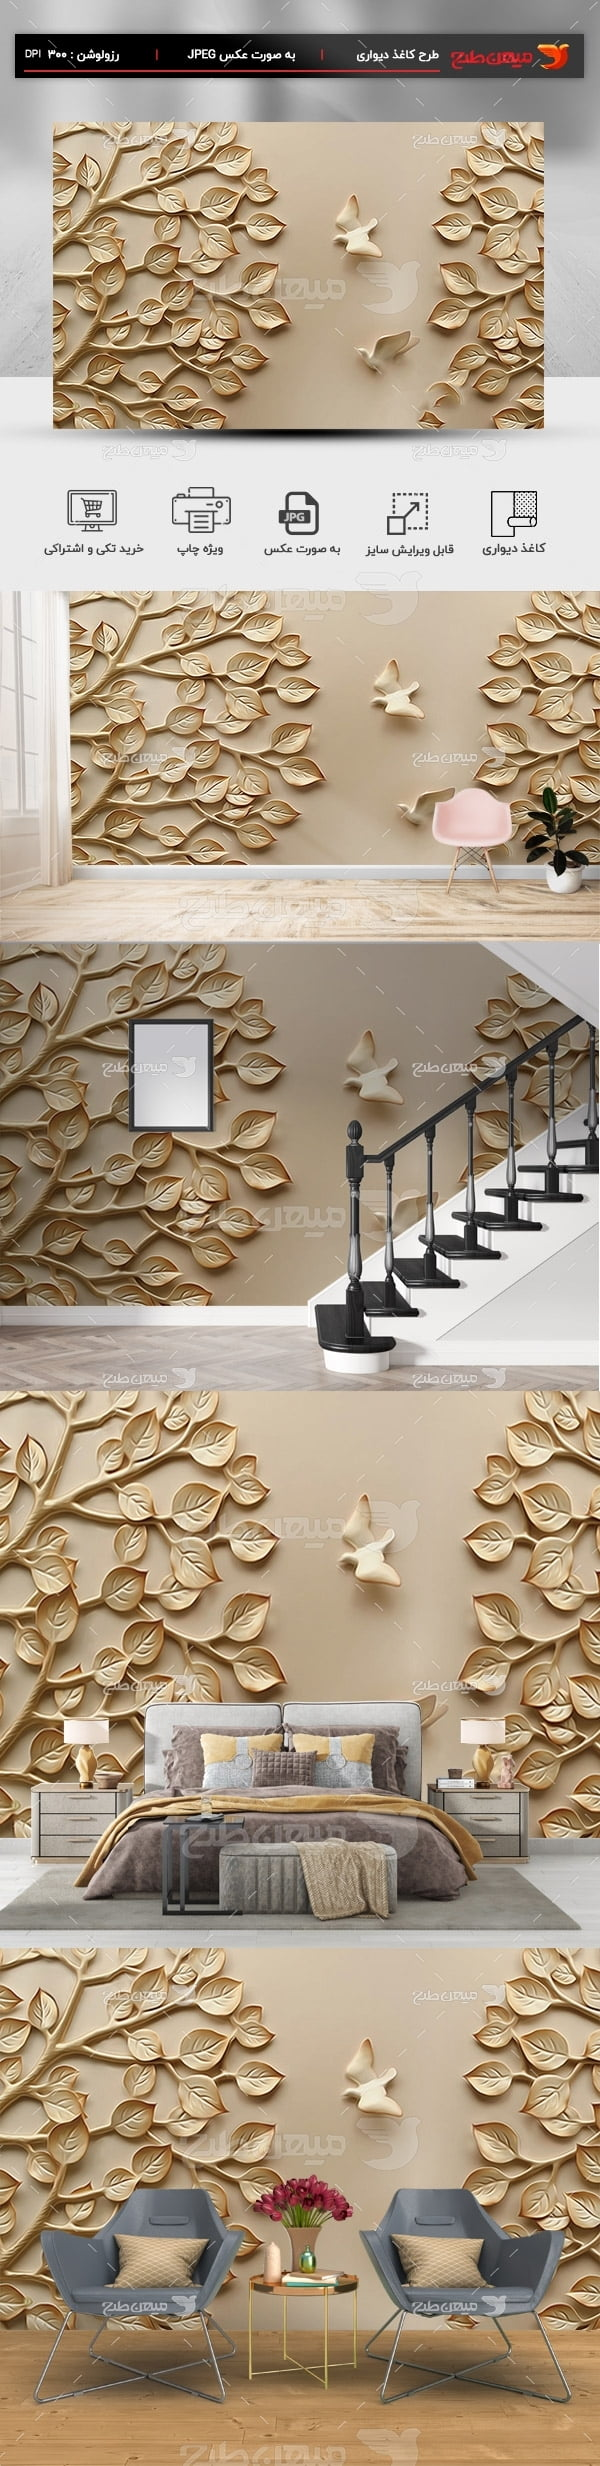 پوستر کاغذ دیواری سه بعدی طرح برگ طلایی